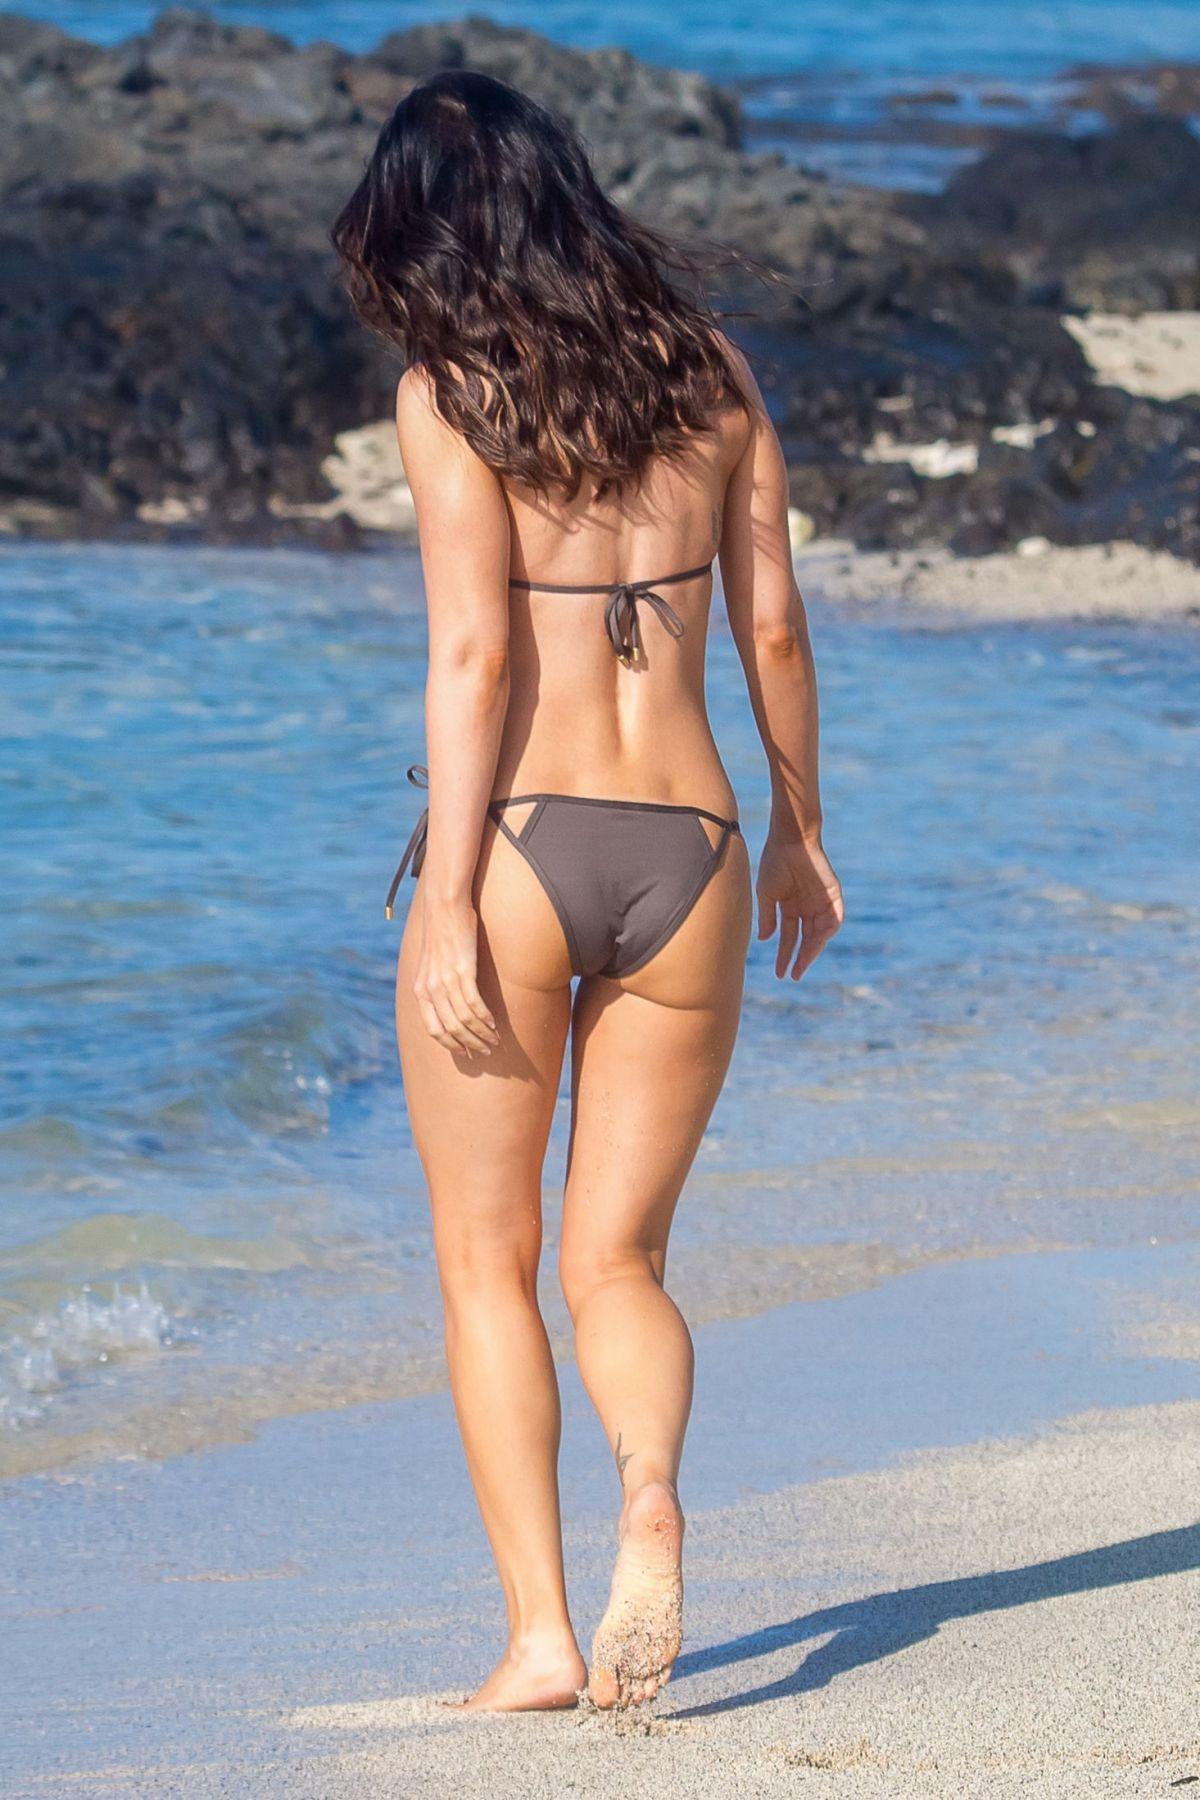 Teresa Dilger Fappening Erotic photos Slackerjack platform racing,Taylor momsen topless new photo